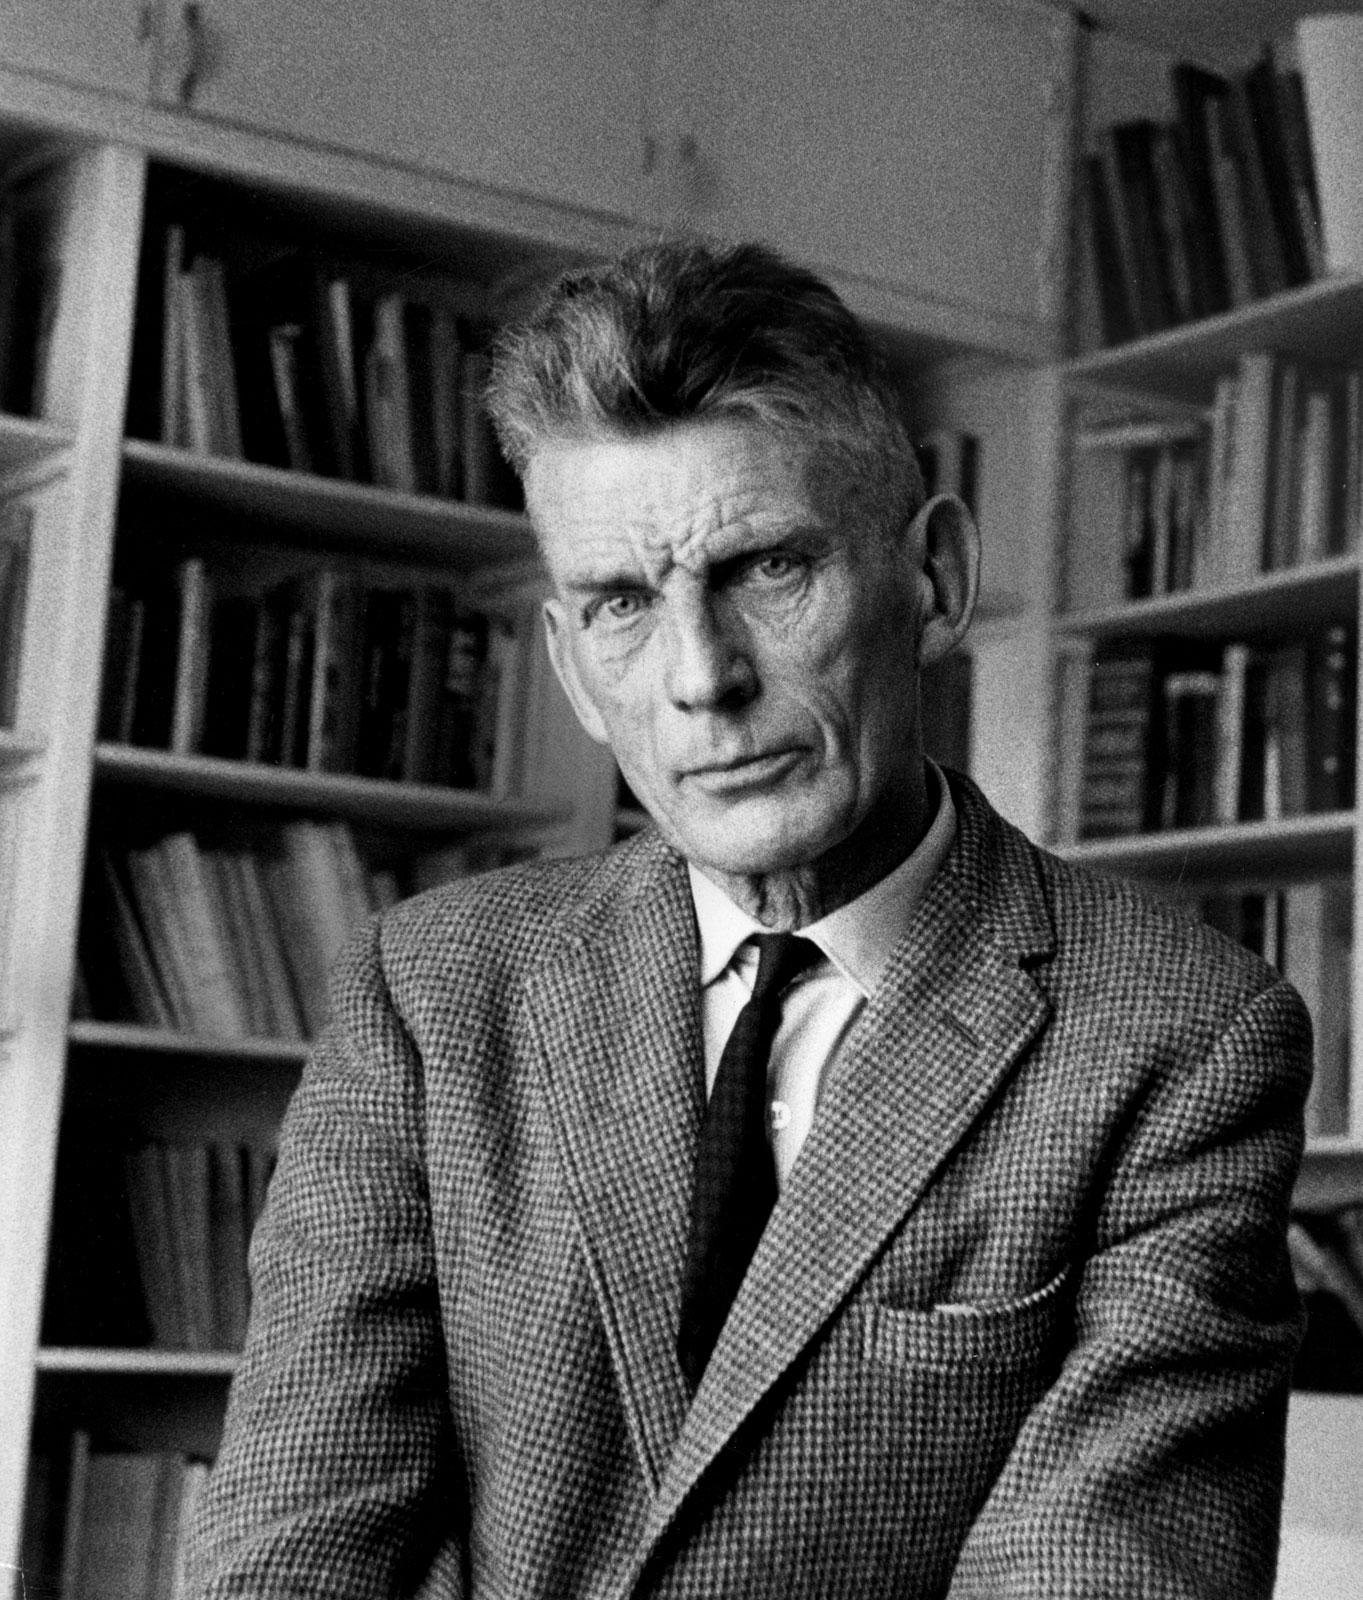 Samuel Beckett in 1965. © Gisèle Freund, via Encyclopædia Brittanica